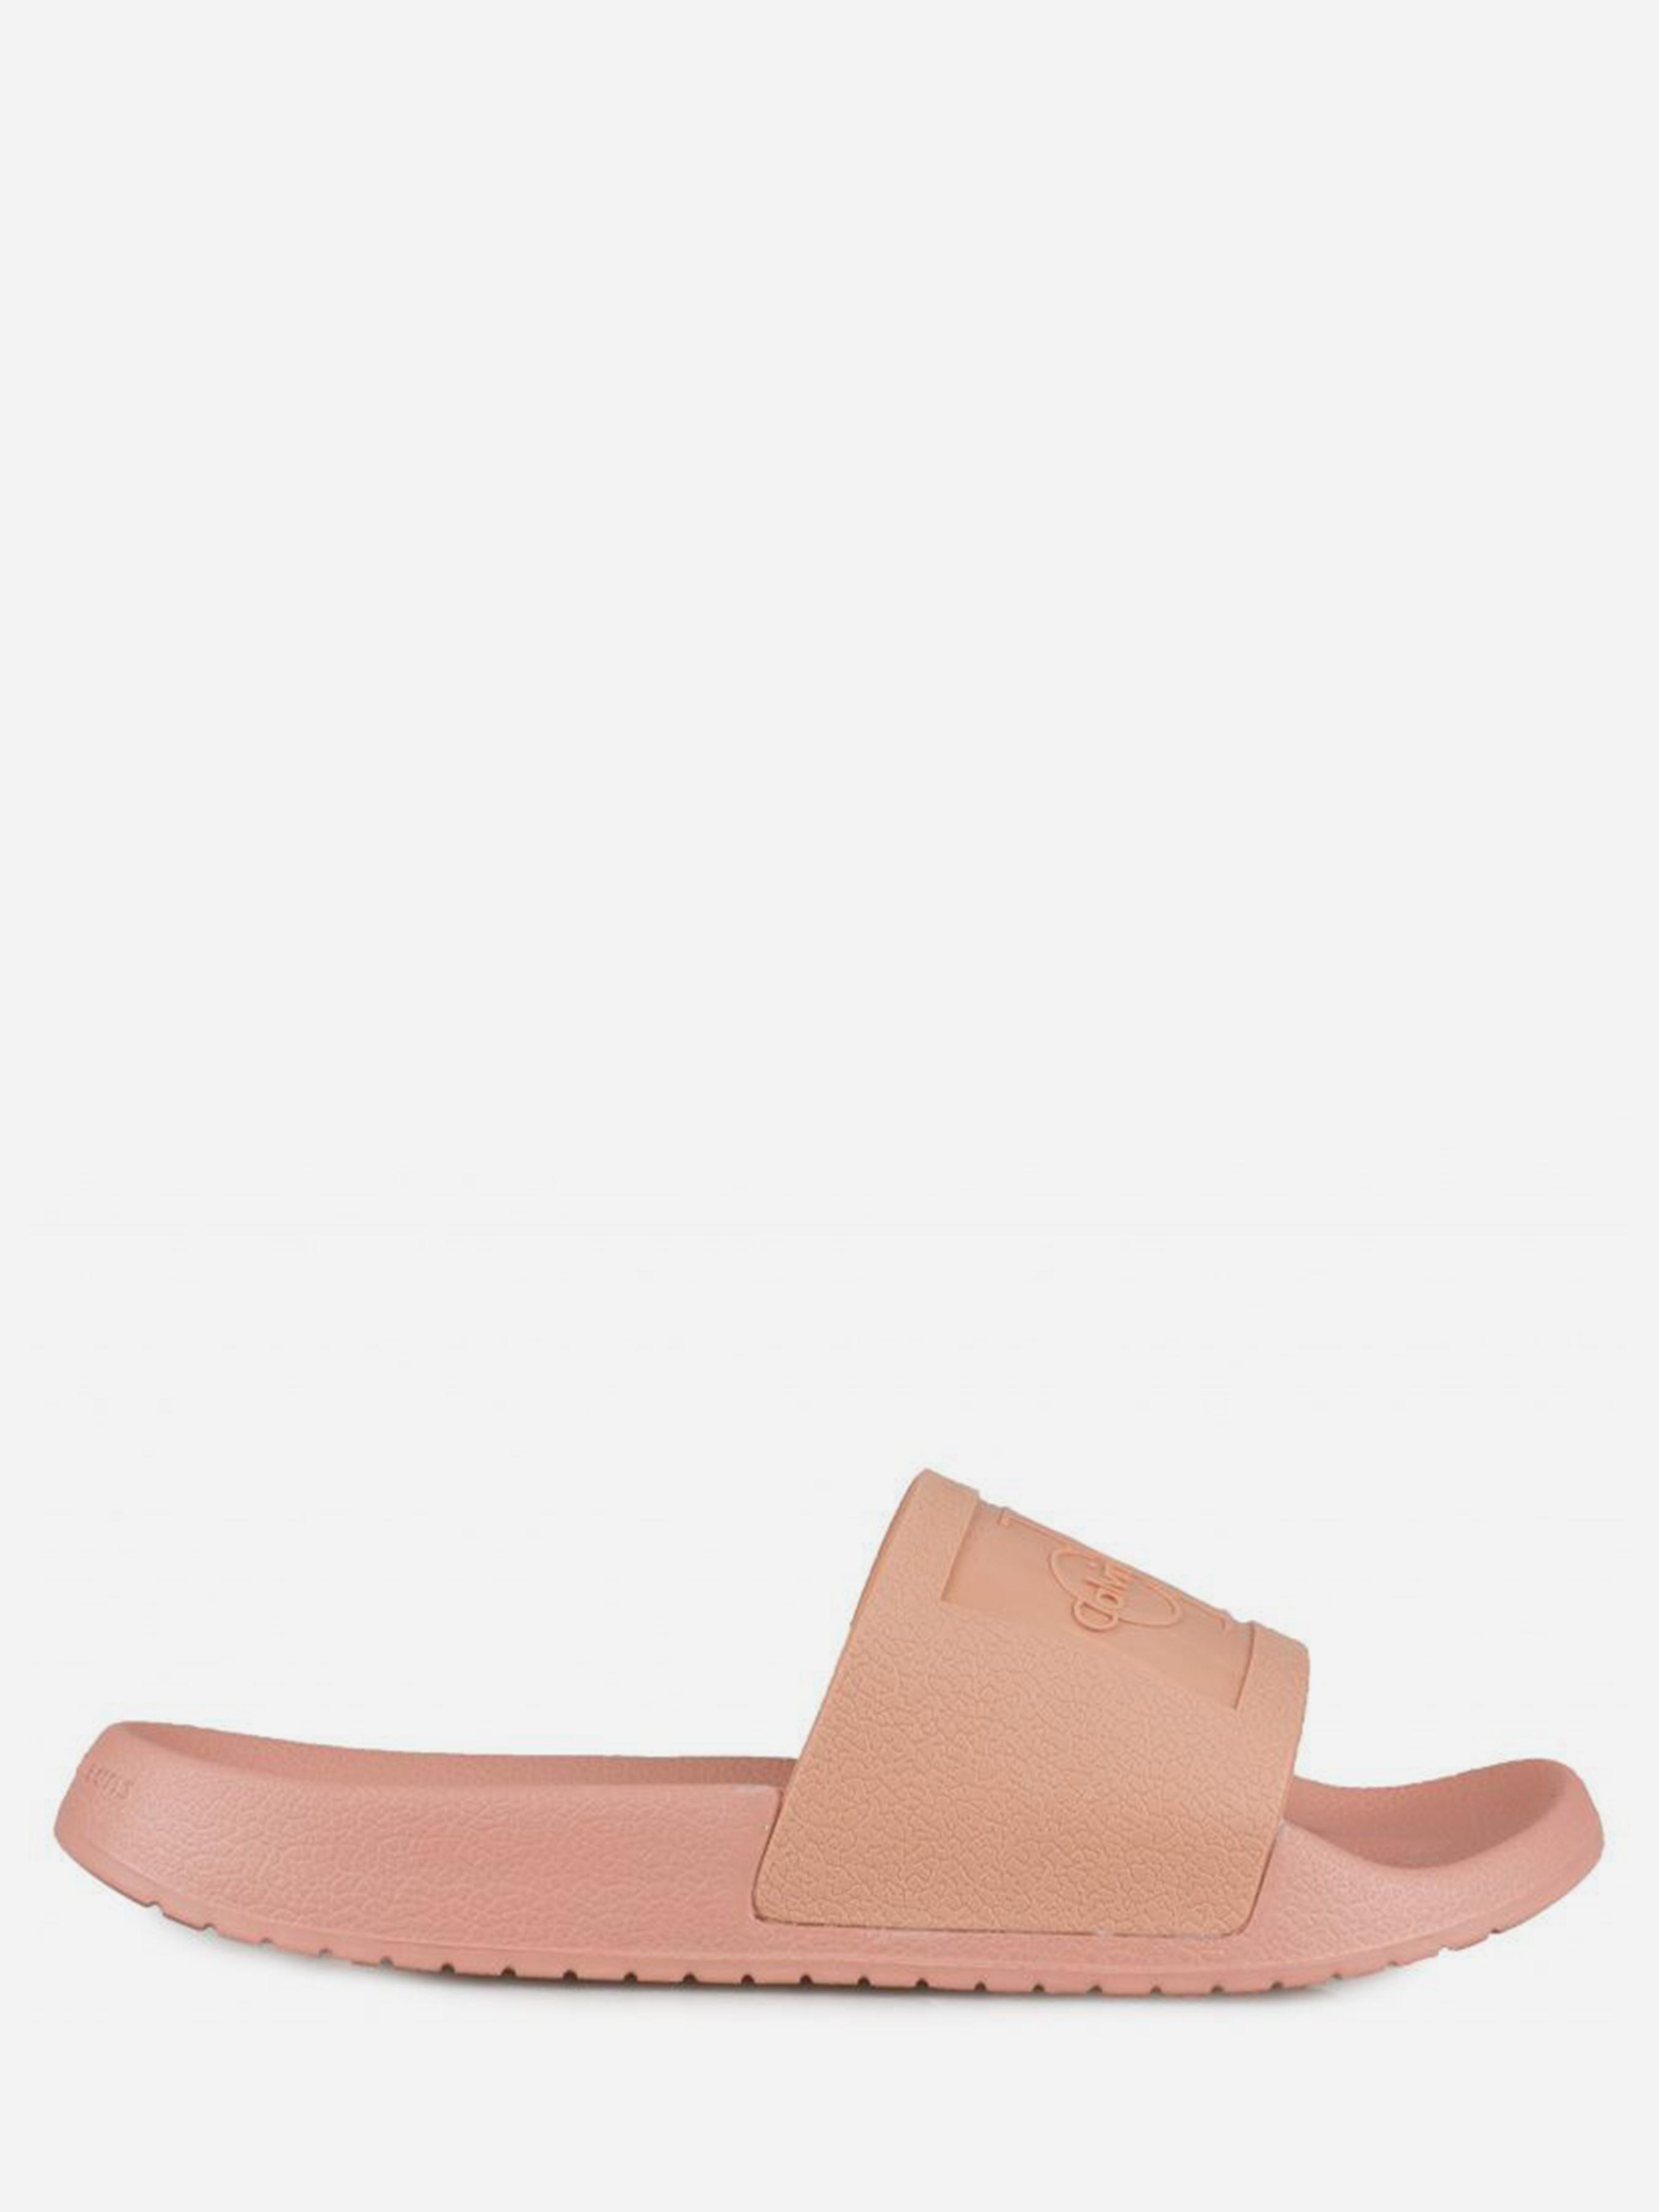 Шлёпанцы для женщин Calvin Klein Jeans 3Y57 купить обувь, 2017